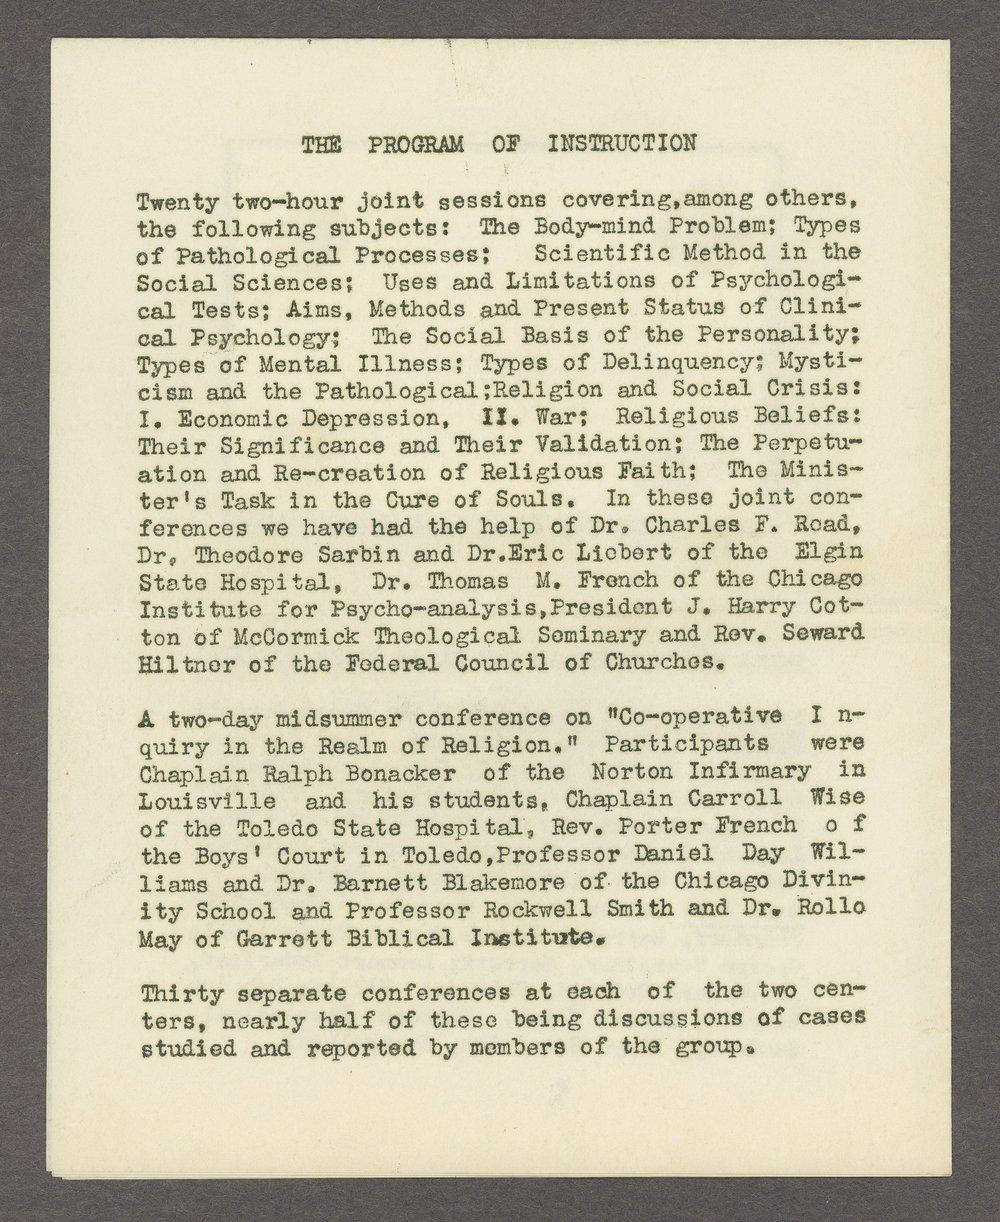 Anton T. Boisen papers - 4